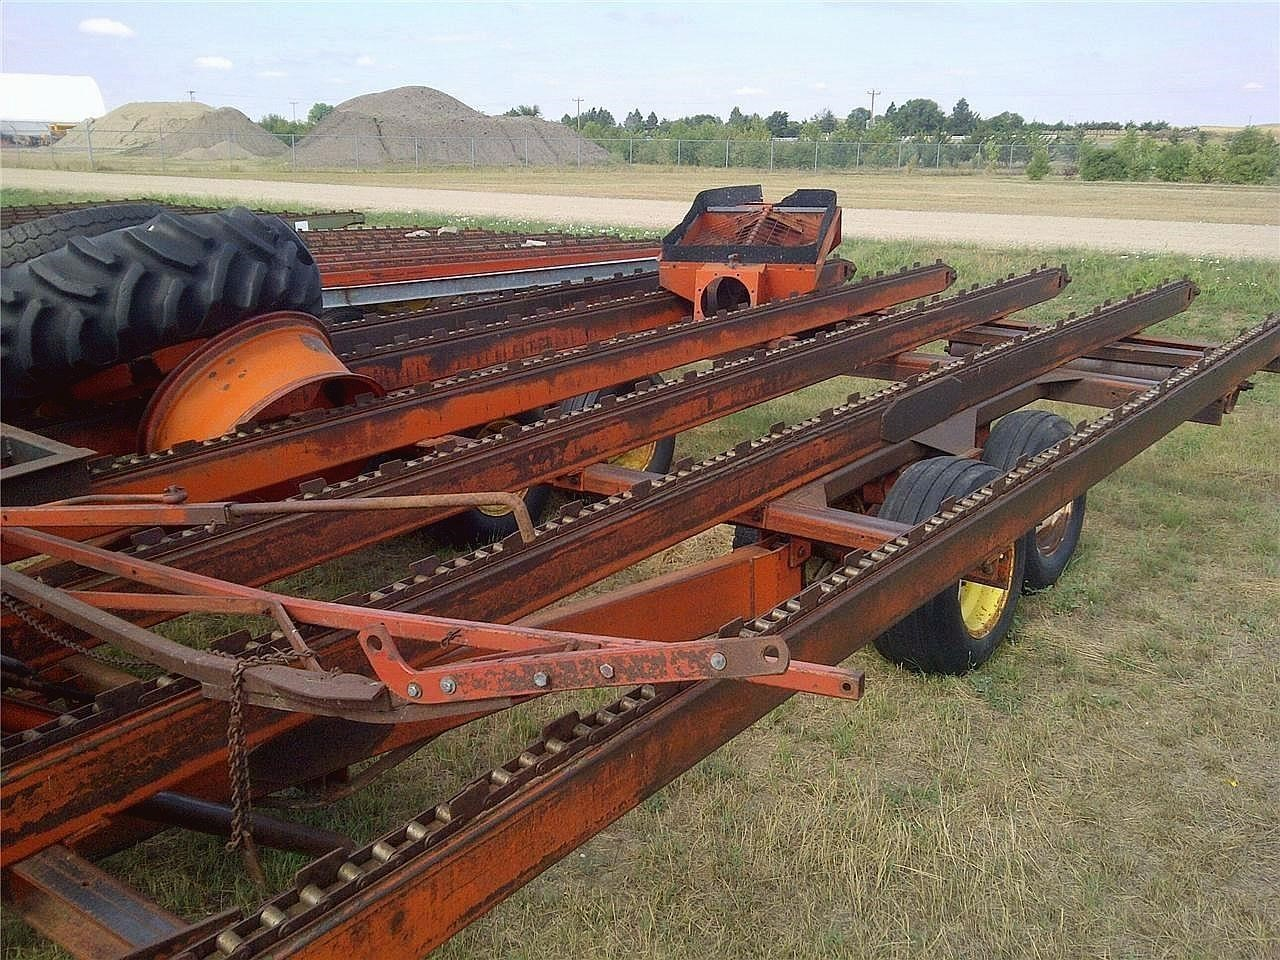 1984 Farmhand 12x24 Bale Wagons and Trailer